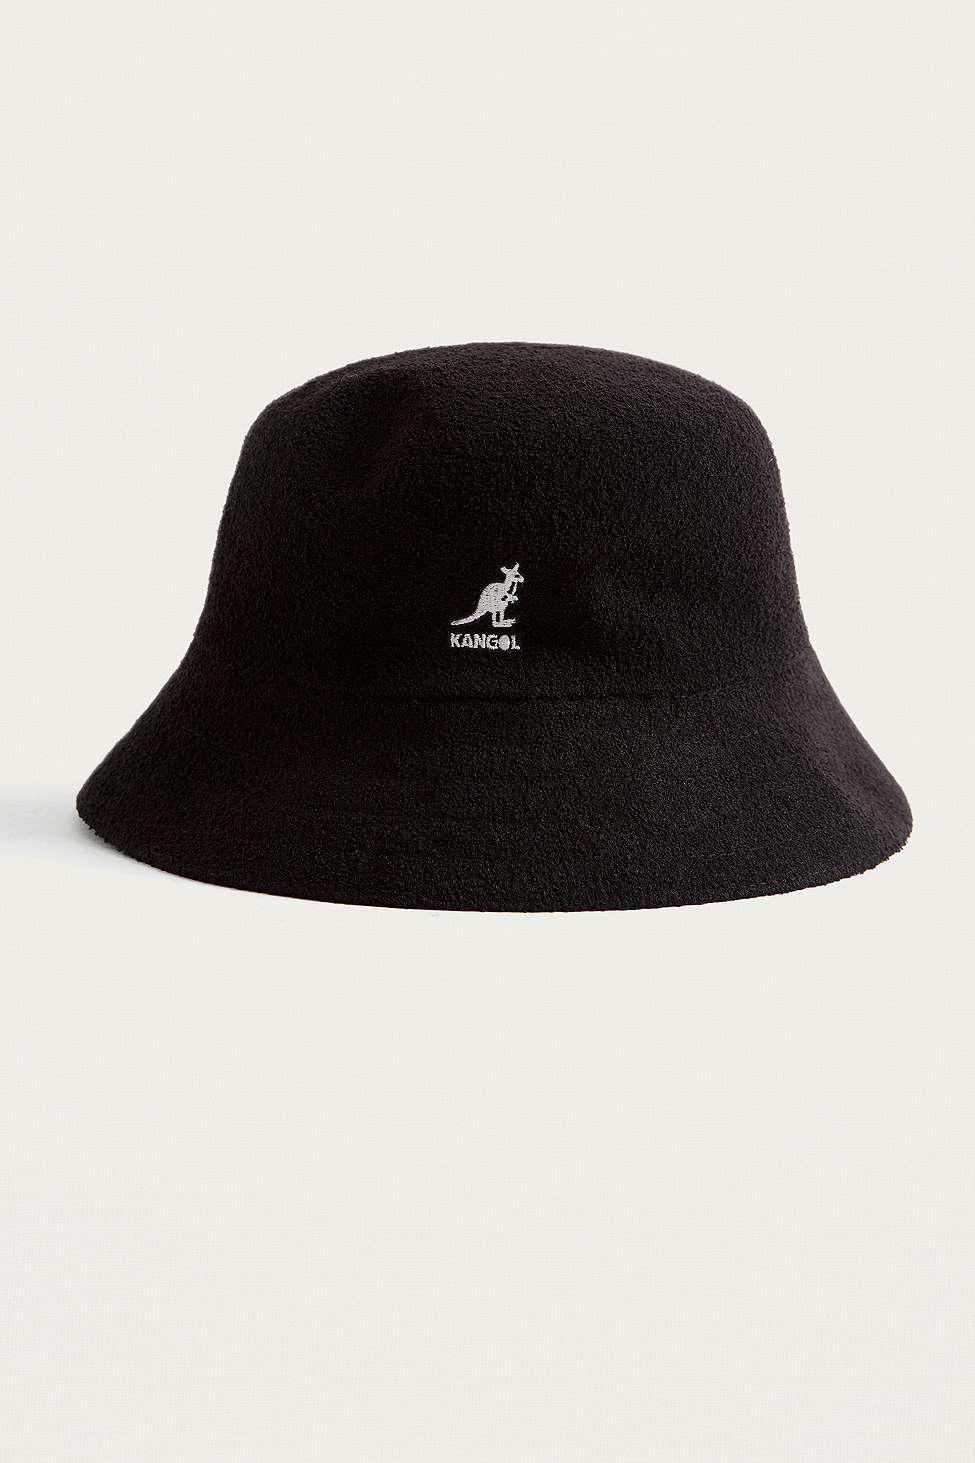 Kangol Bermuda Black Bucket Hat - Mens L in Black for Men - Lyst 884a3ac2f19d